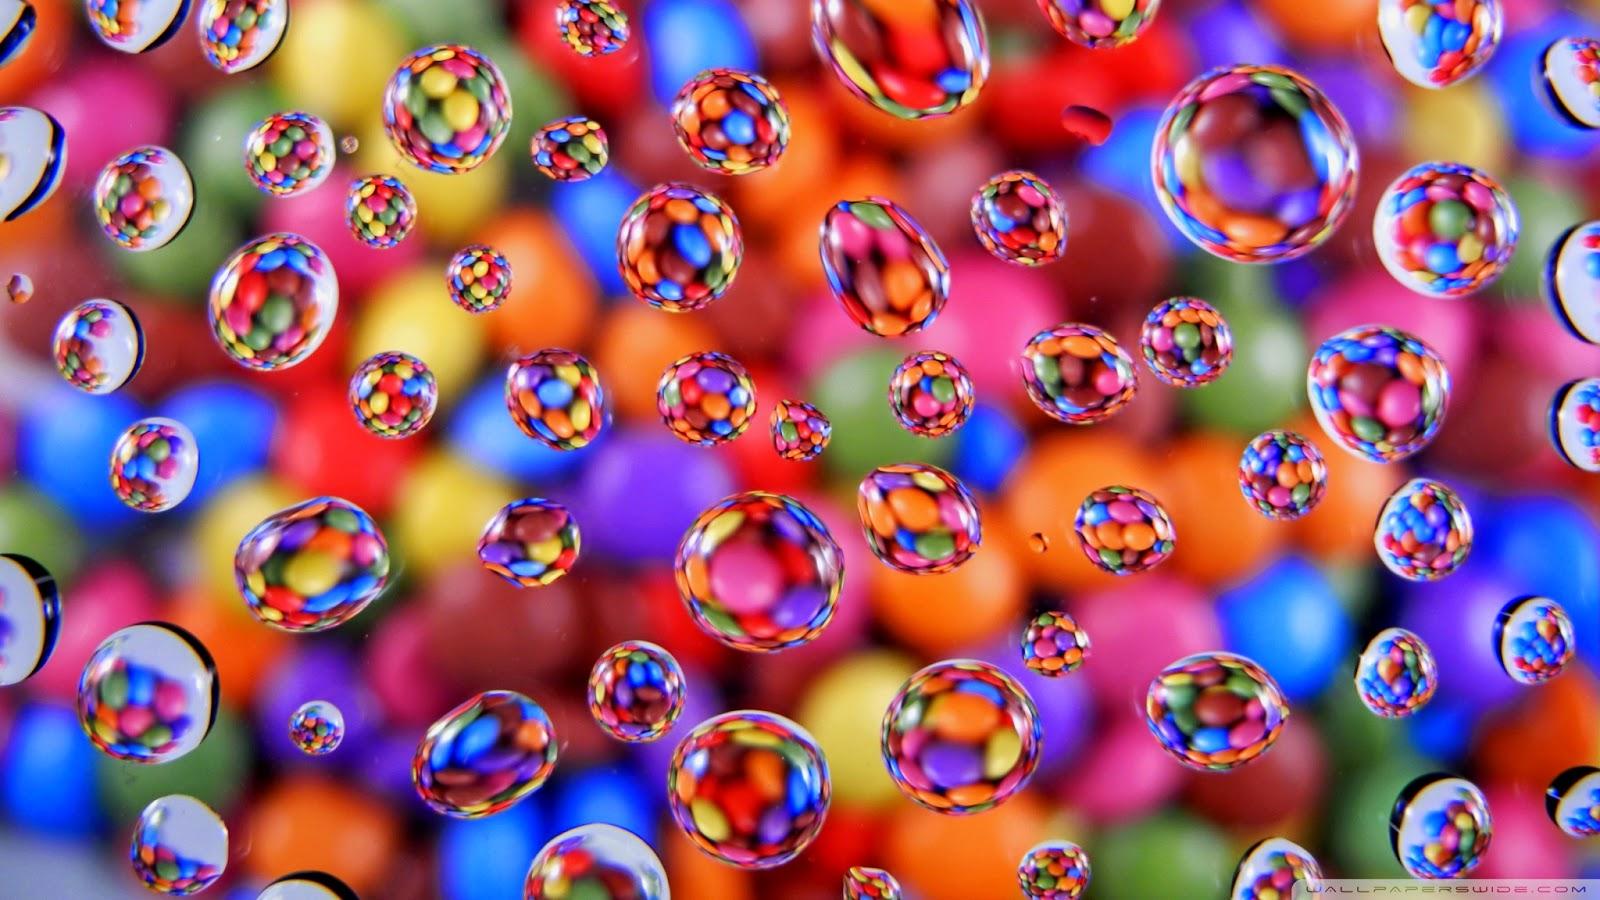 Drops Rainbow 3d Wallpaper Informacion Y Tutoriales Wallpapers Hd 2015 Gratis